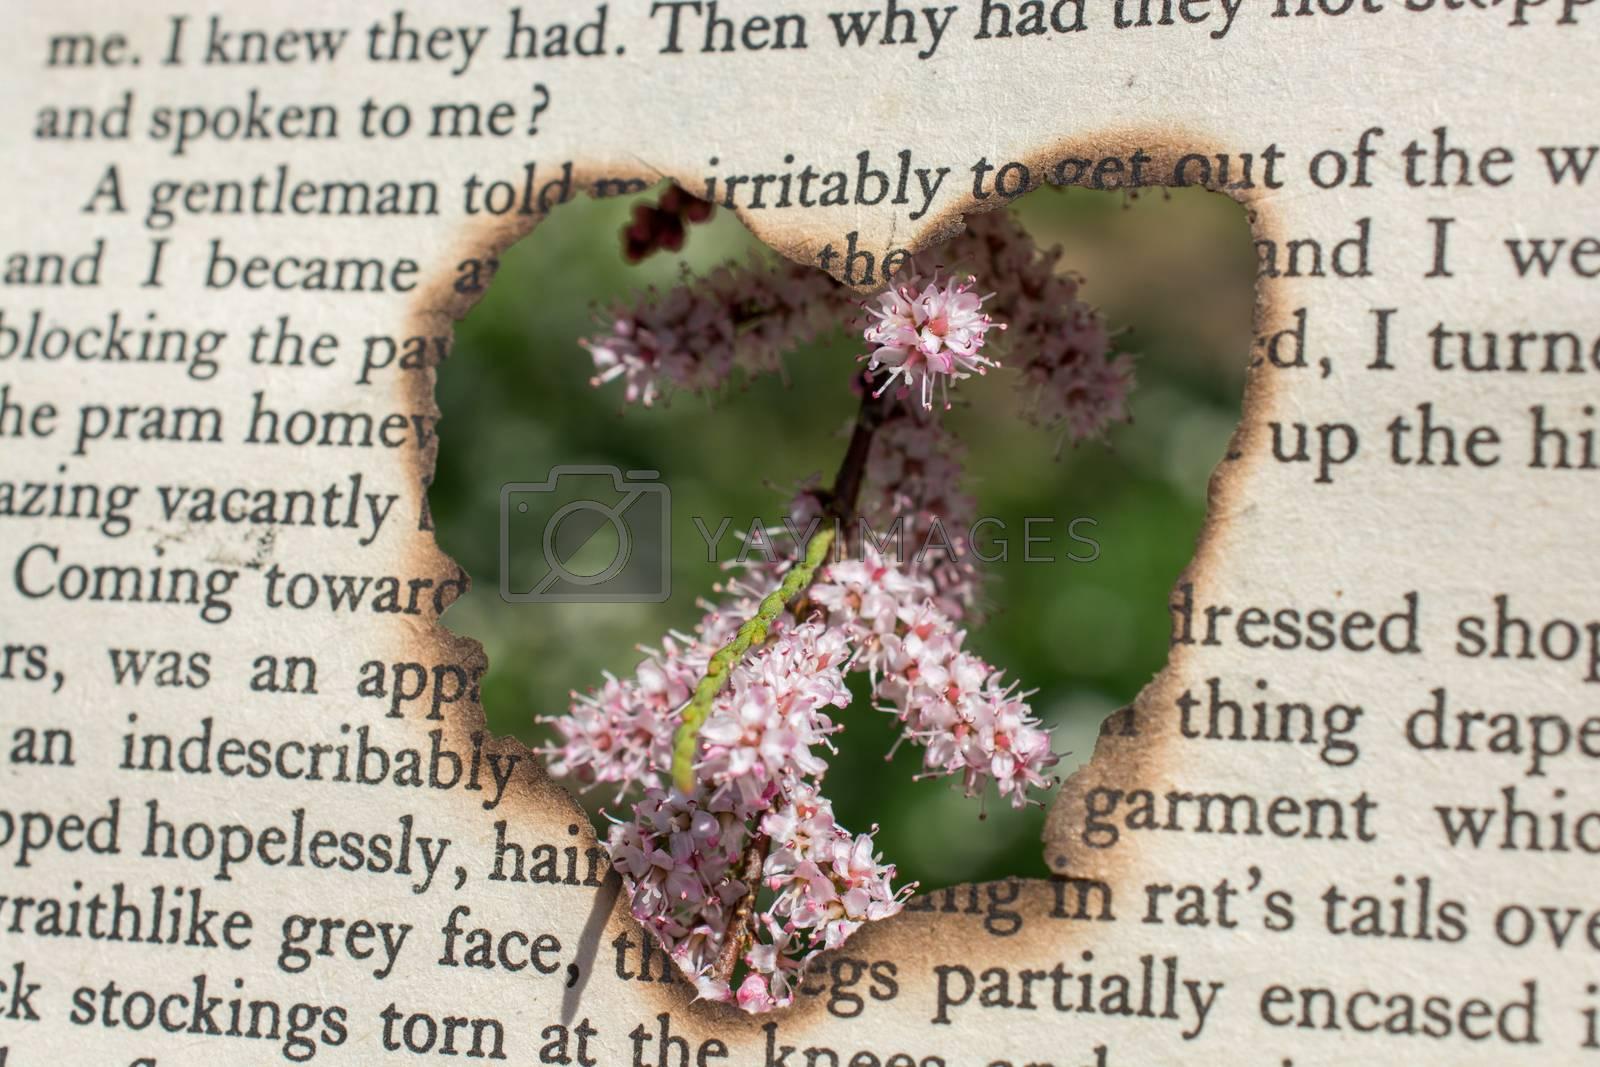 Flowers seen through heart shape cut out of cardboard